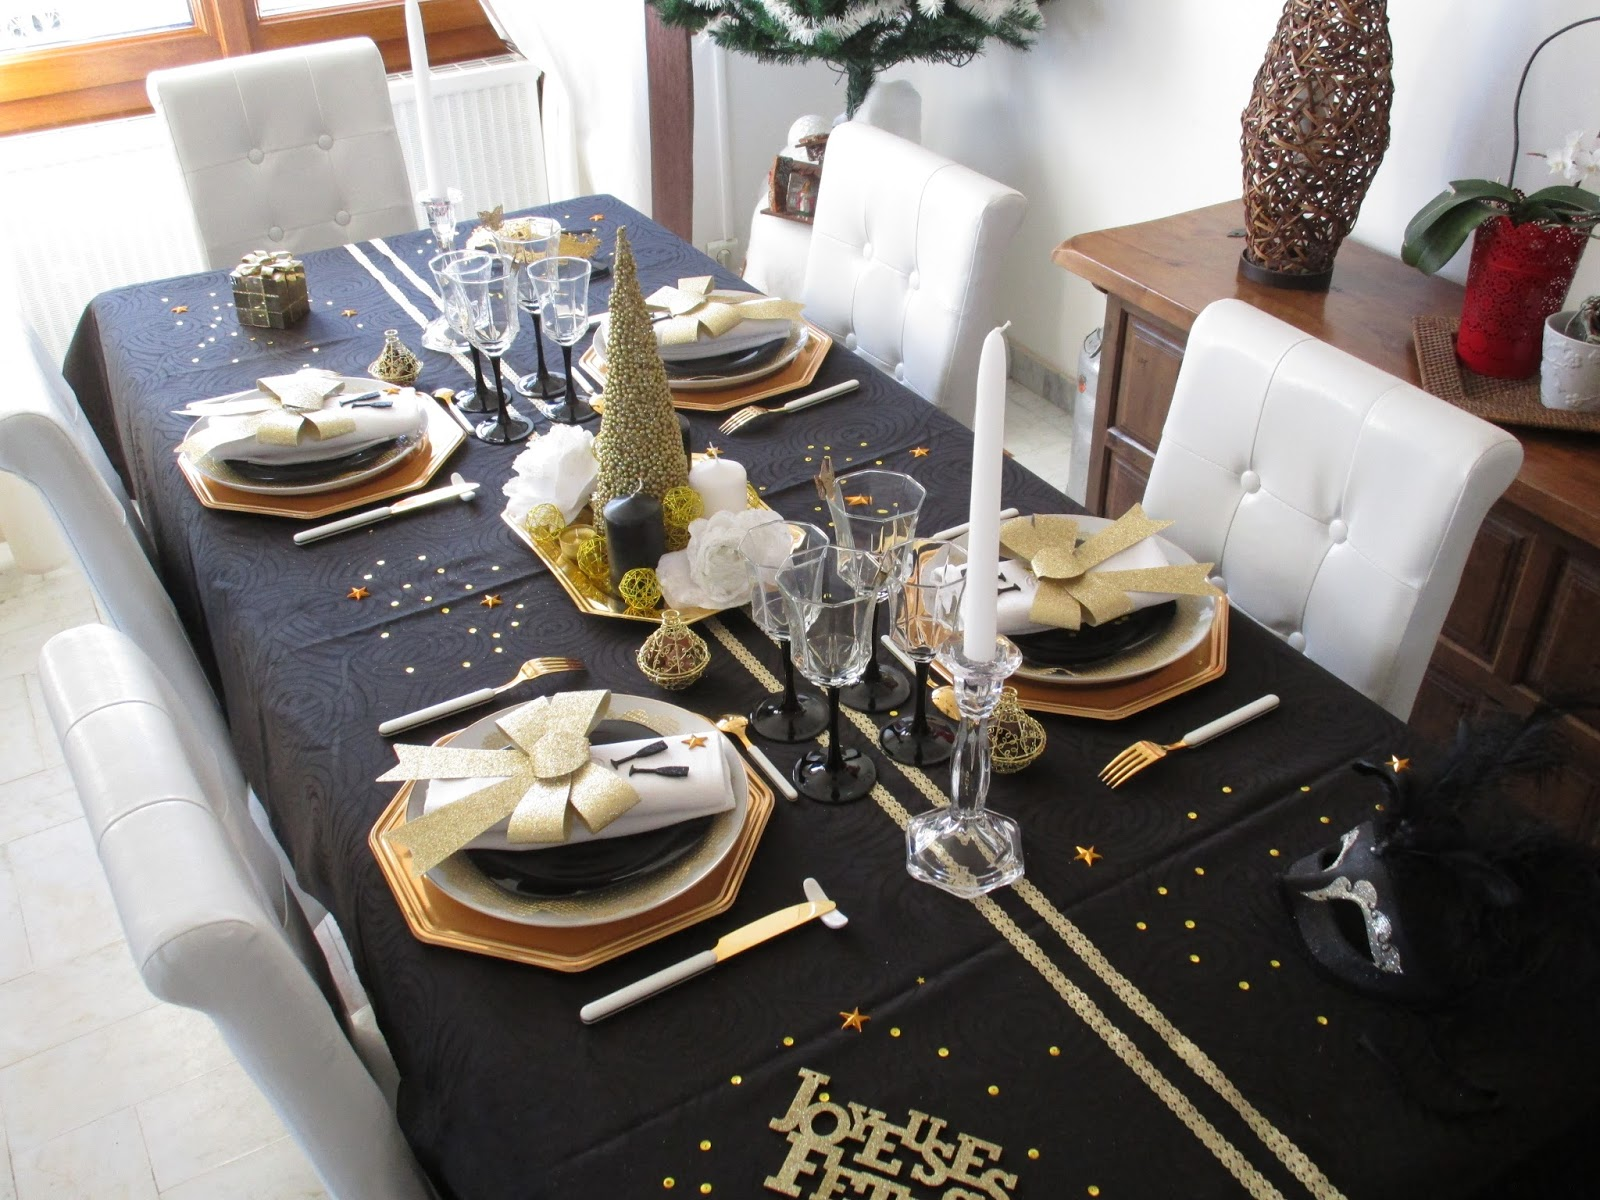 deco table nouvel an noir et or. Black Bedroom Furniture Sets. Home Design Ideas